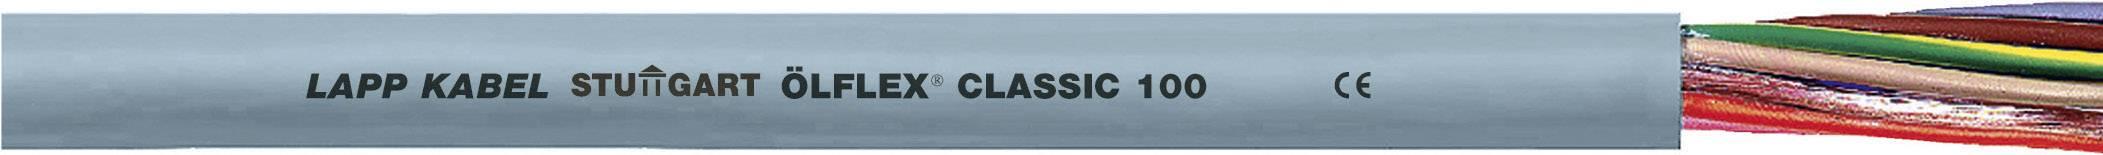 Kabel LappKabel Ölflex CLASSIC 100 3G25 (0010303), PVC, 23 mm, 750 V, šedá, 1000 m